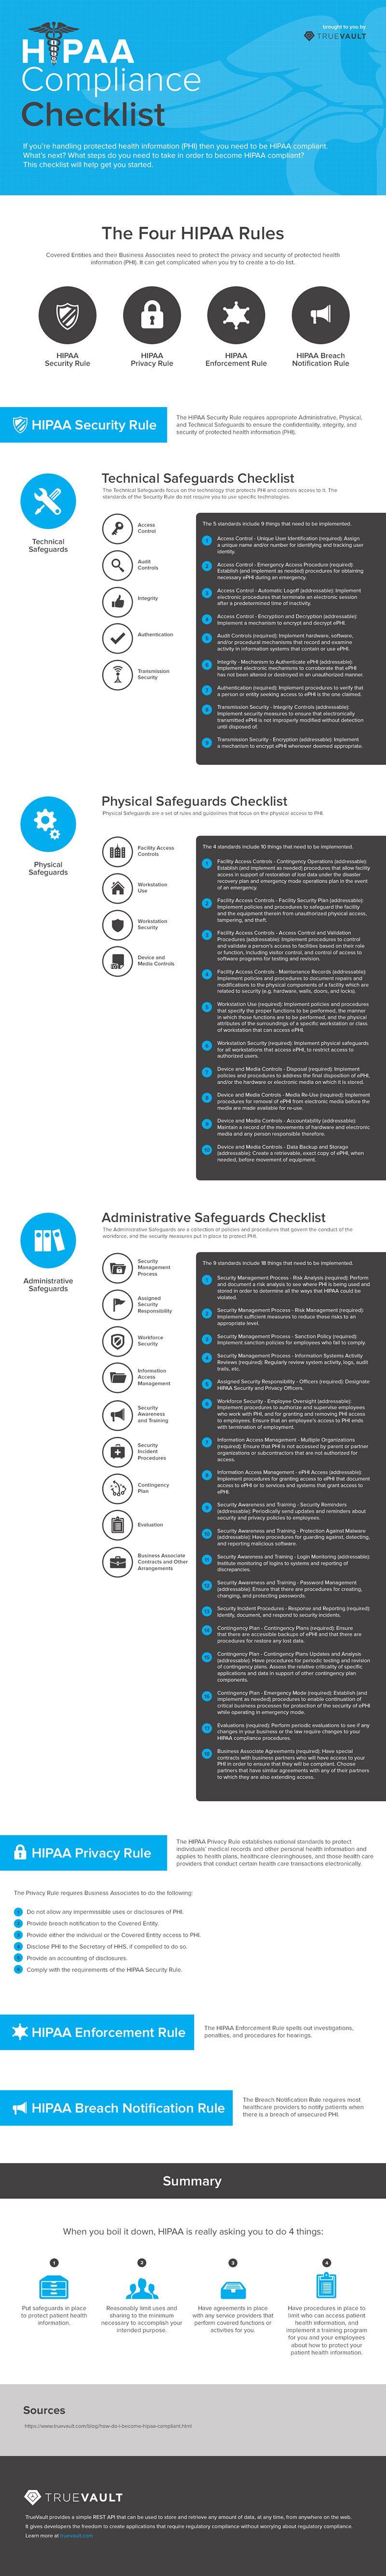 Hipaa compliance checklist download dental insurance